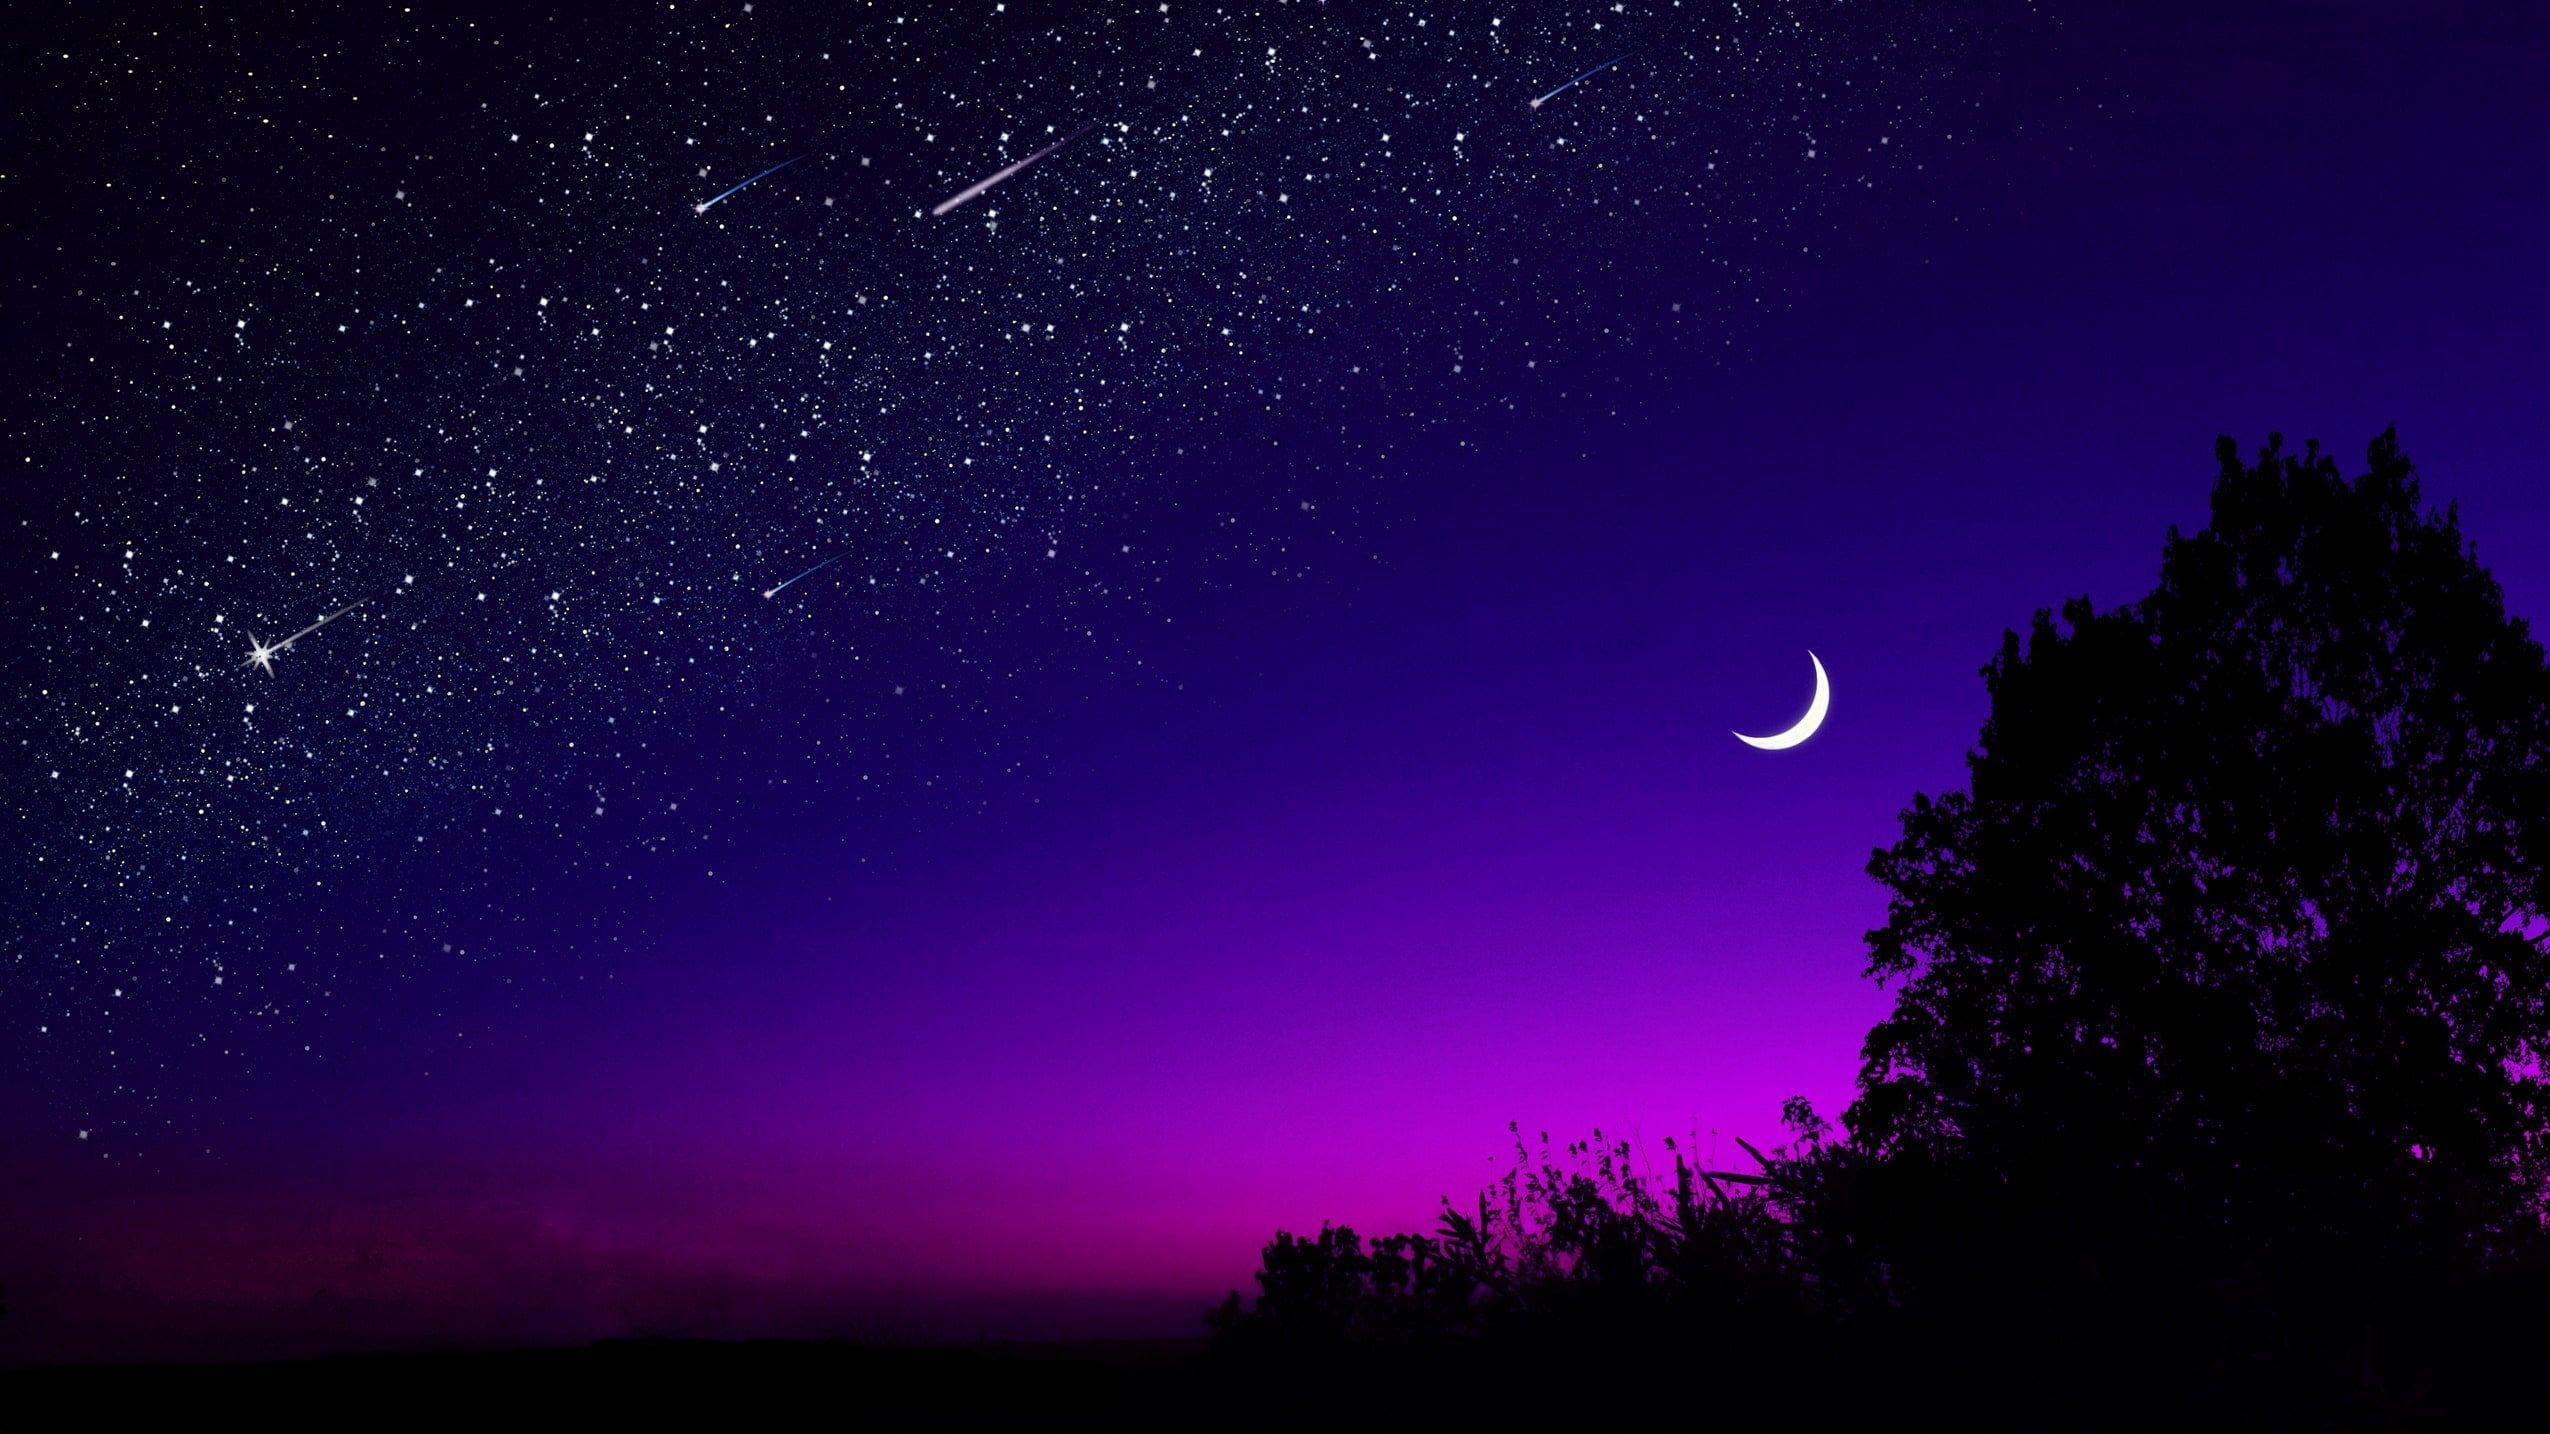 Pin By Ashfaque Khan On God S Art Night Sky Wallpaper Beautiful Wallpaper Hd Purple Sky 1080p night sky moon wallpaper hd